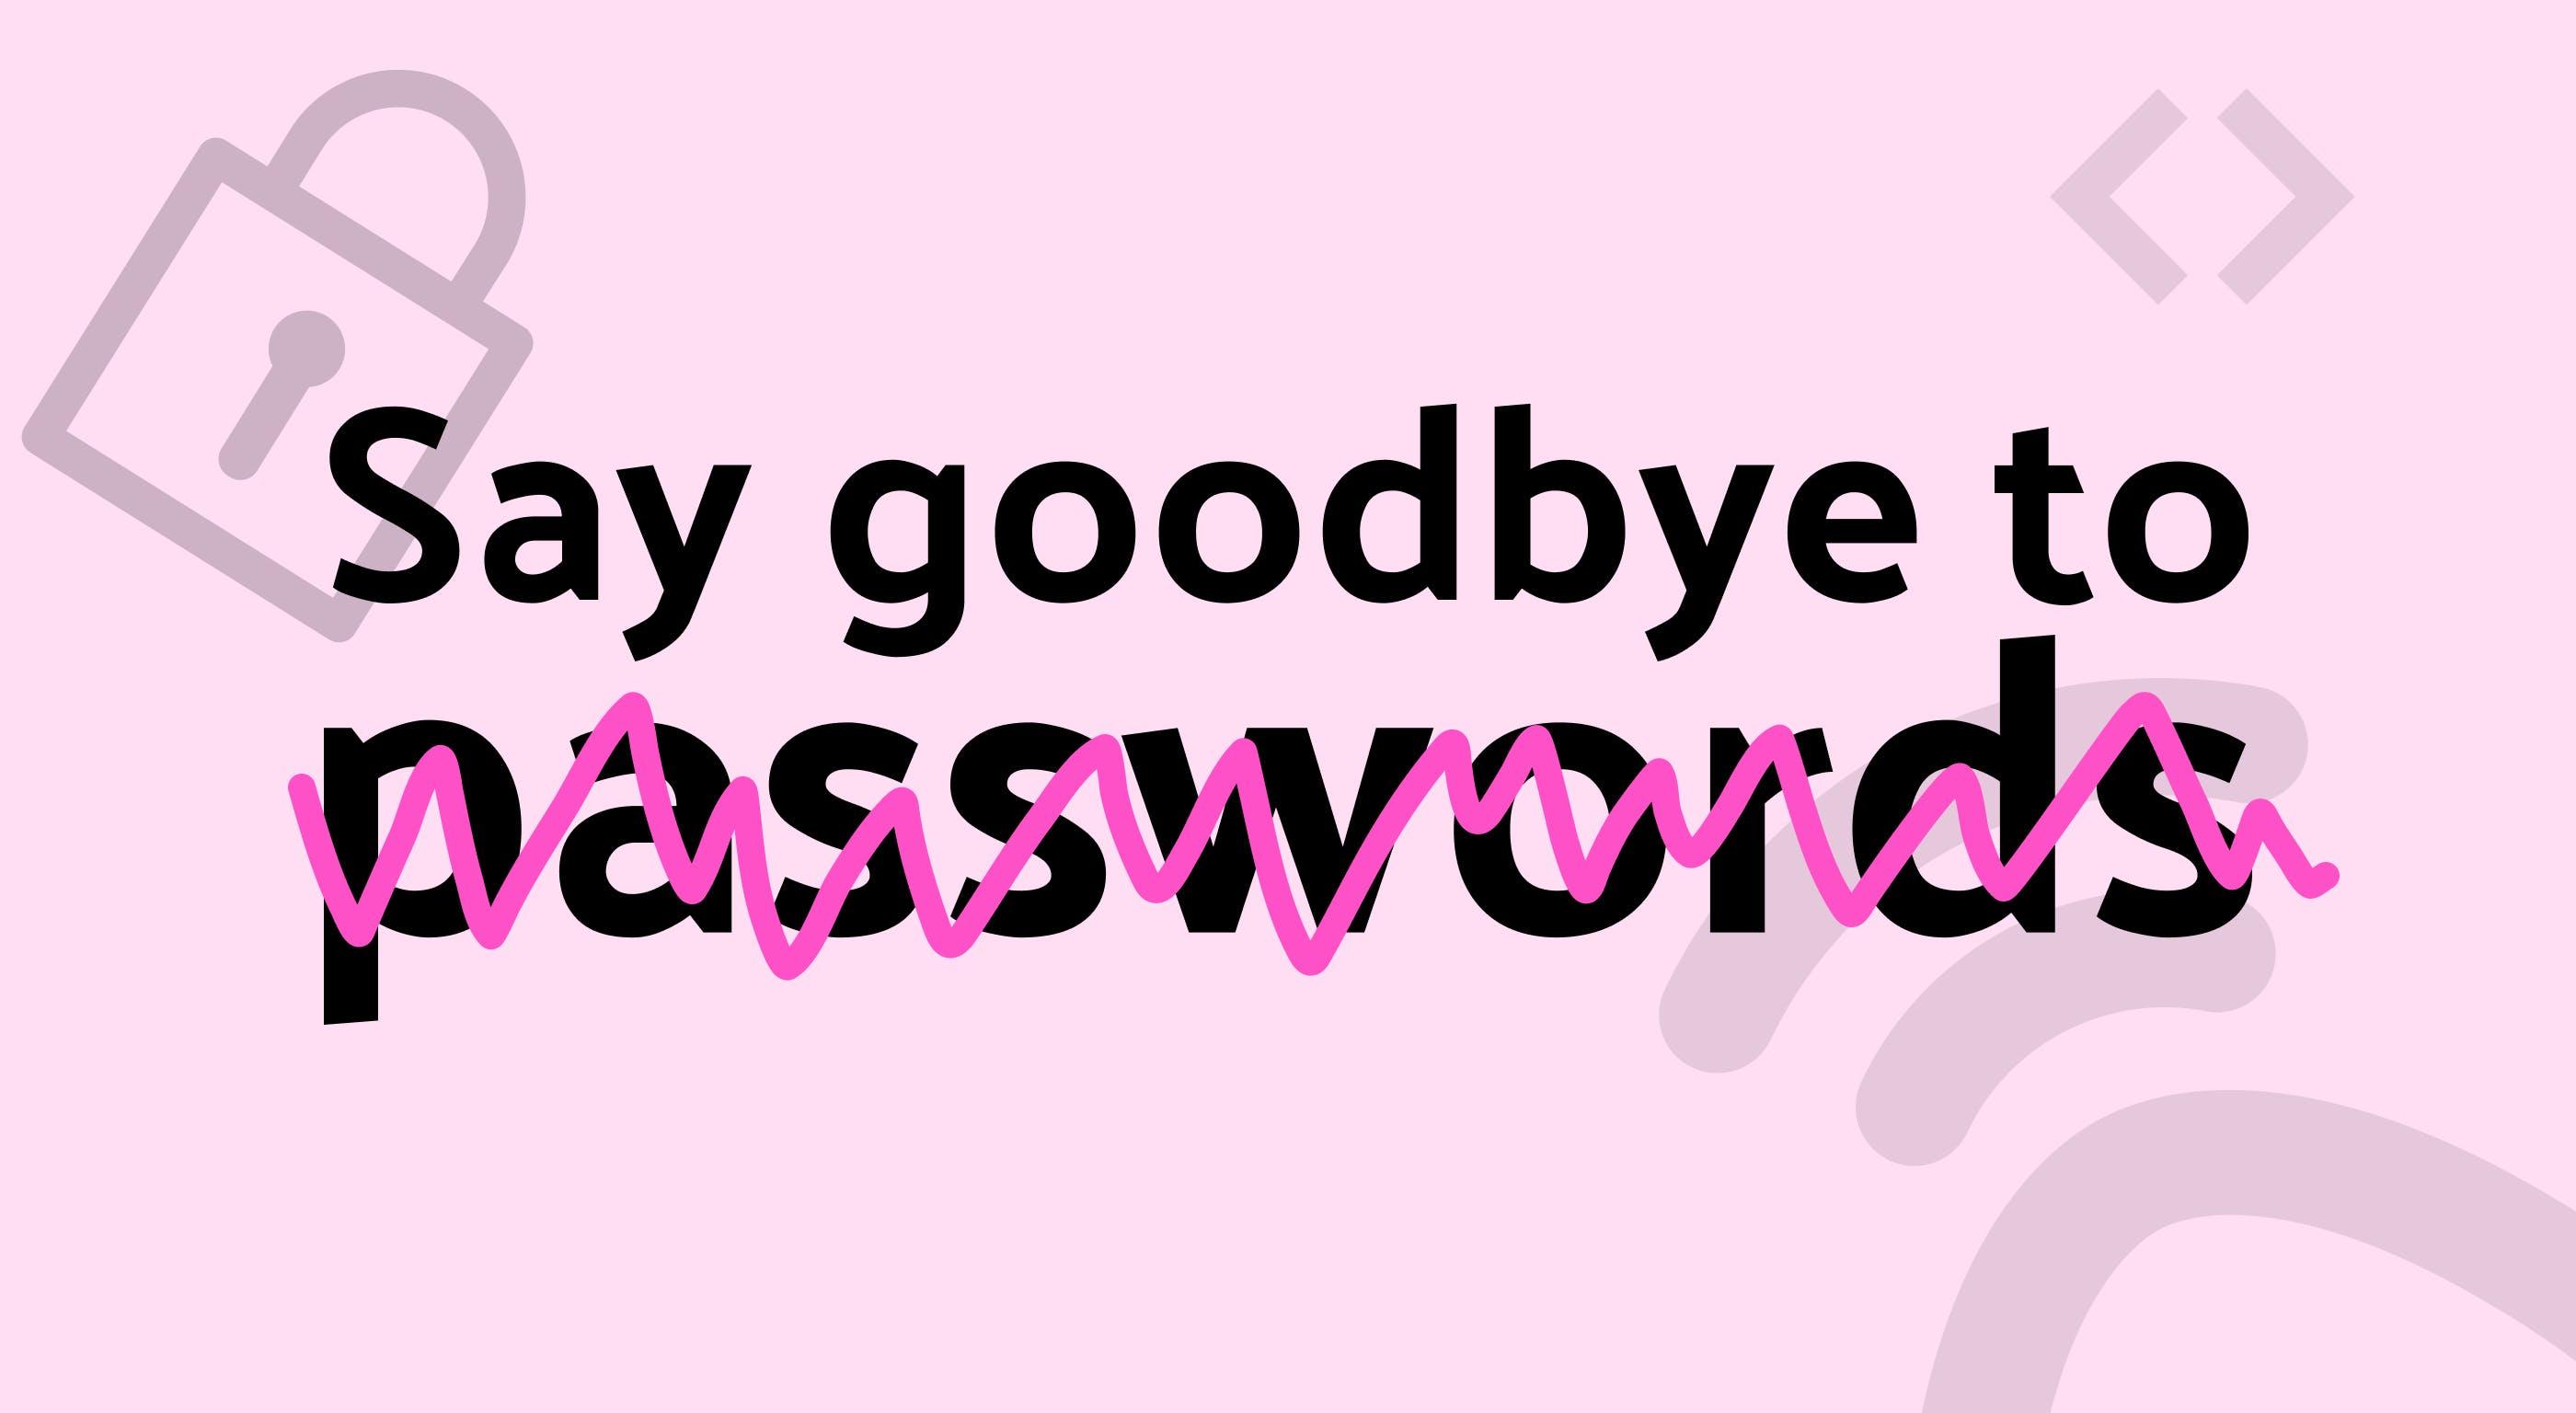 Say goodbye to passwords